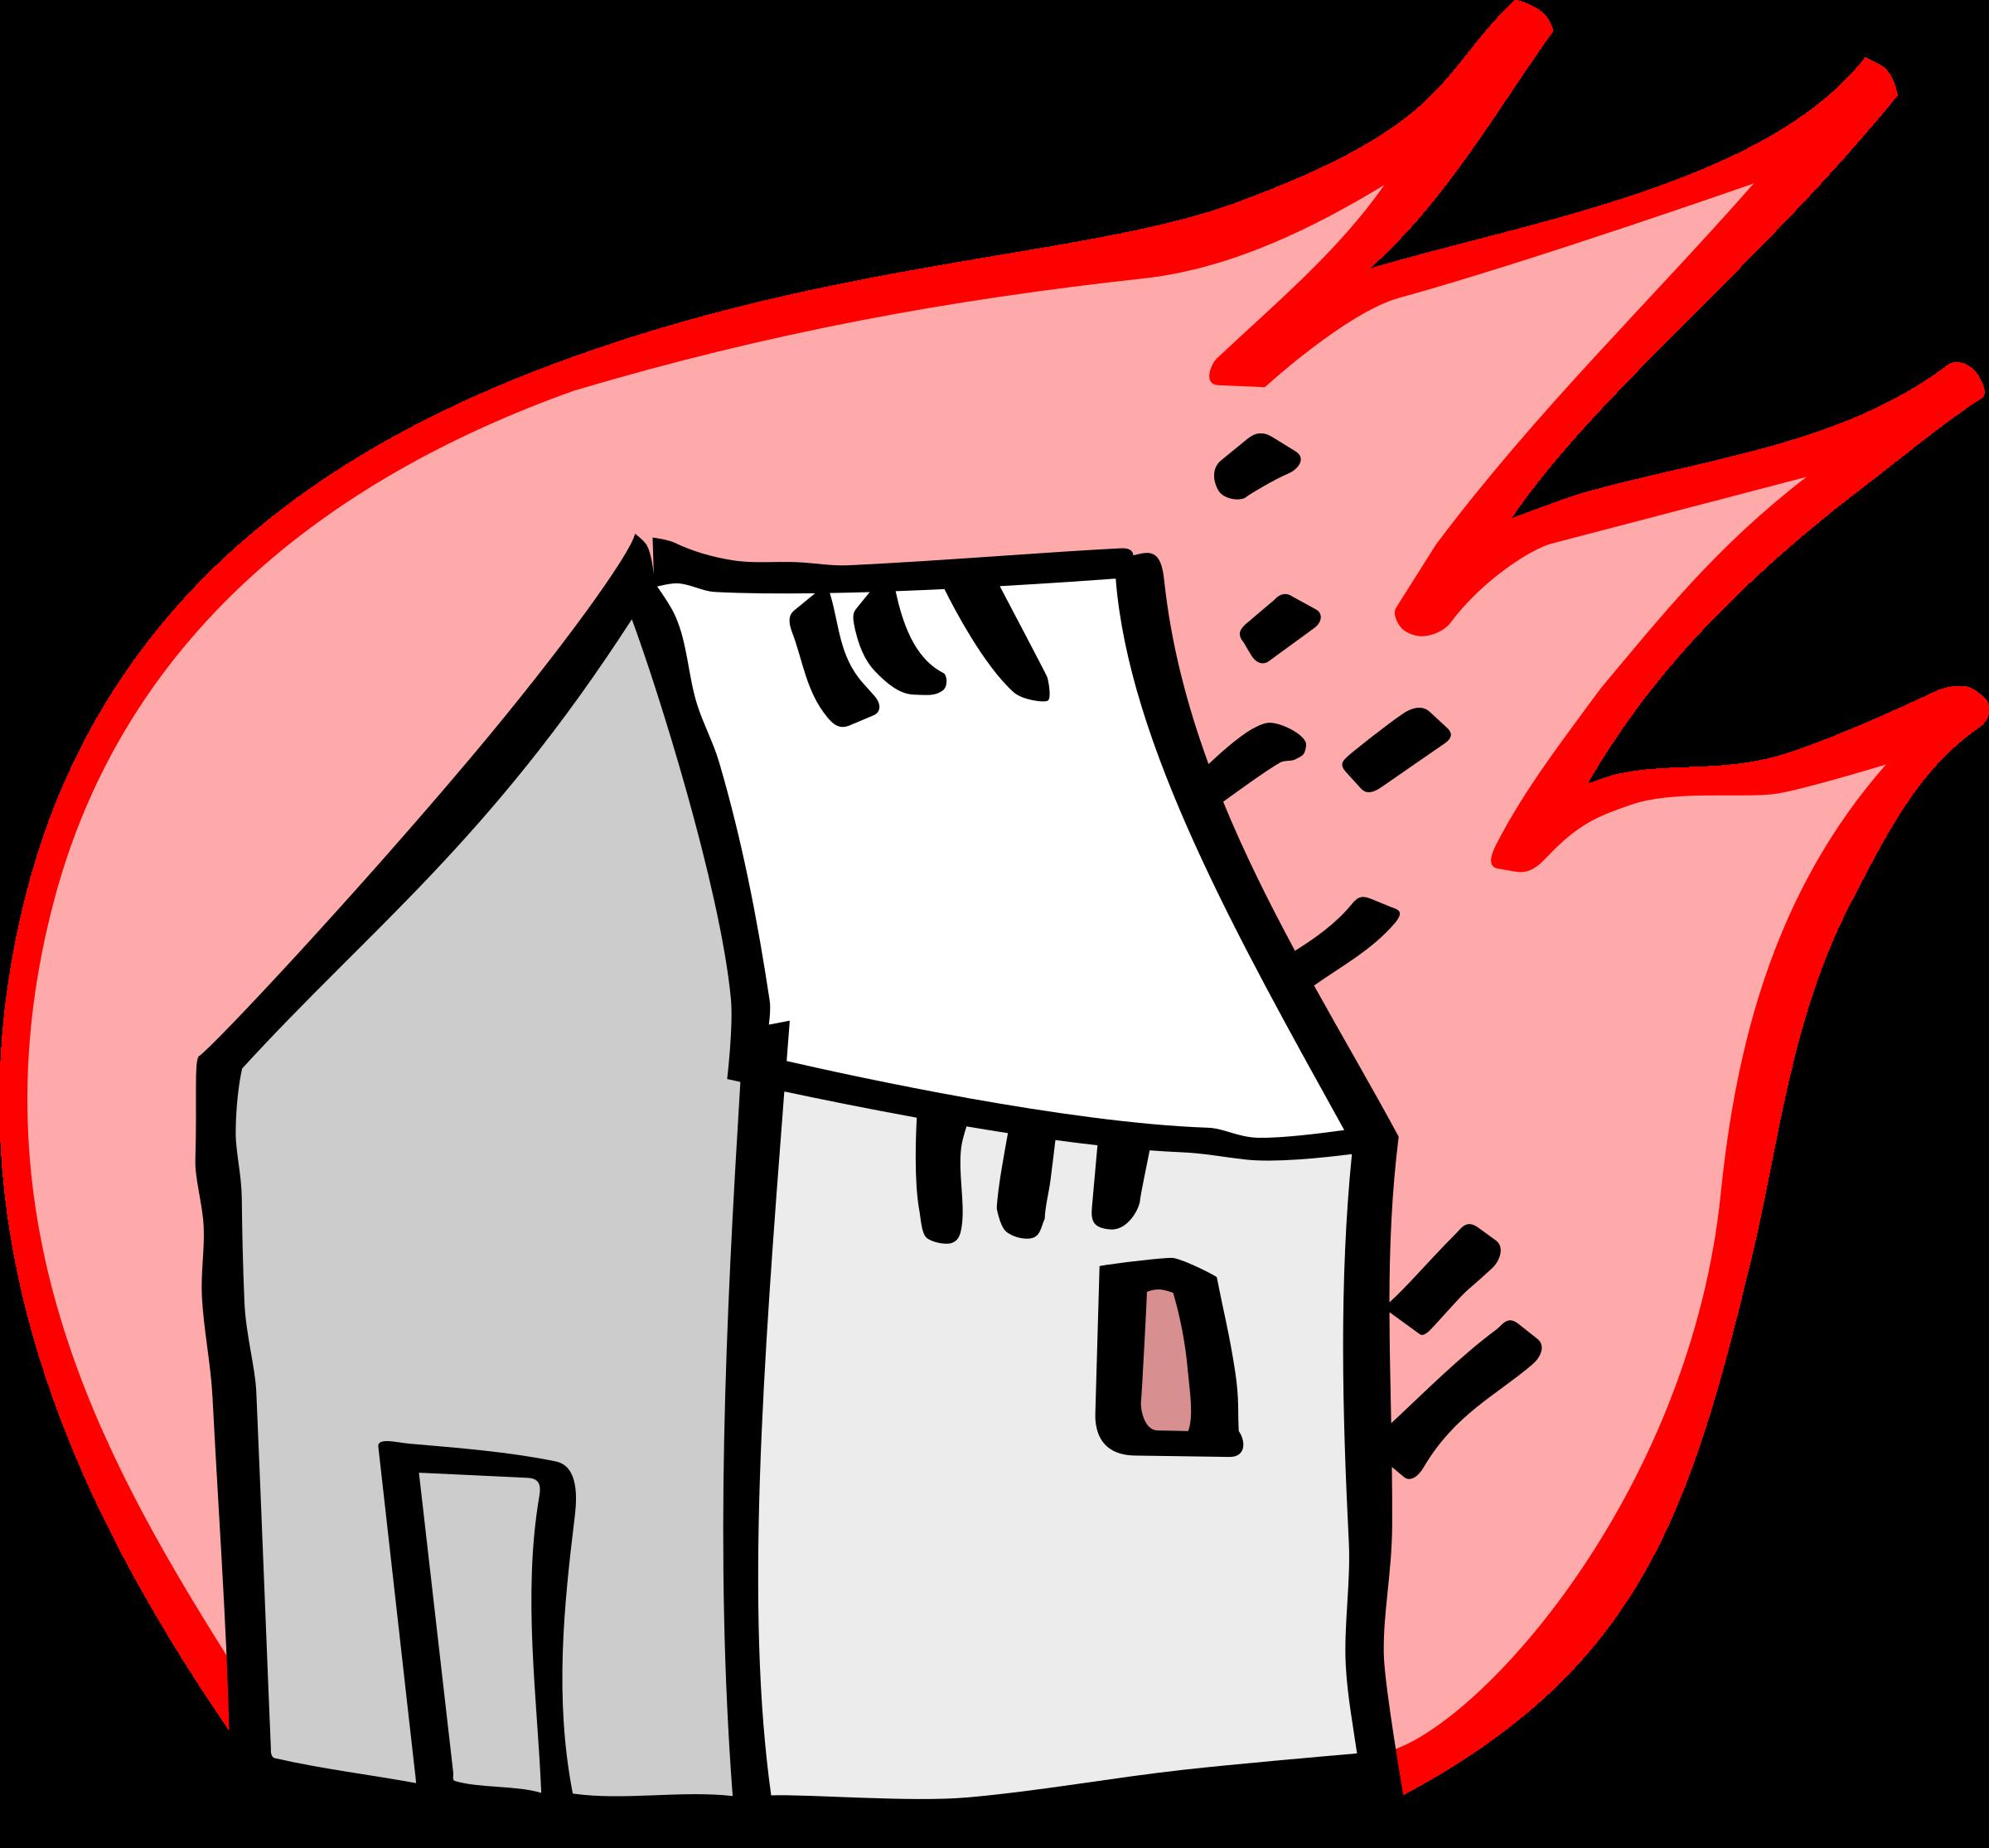 Burning house clipart clip Clipart - Solea's burning house (graffiti) clip